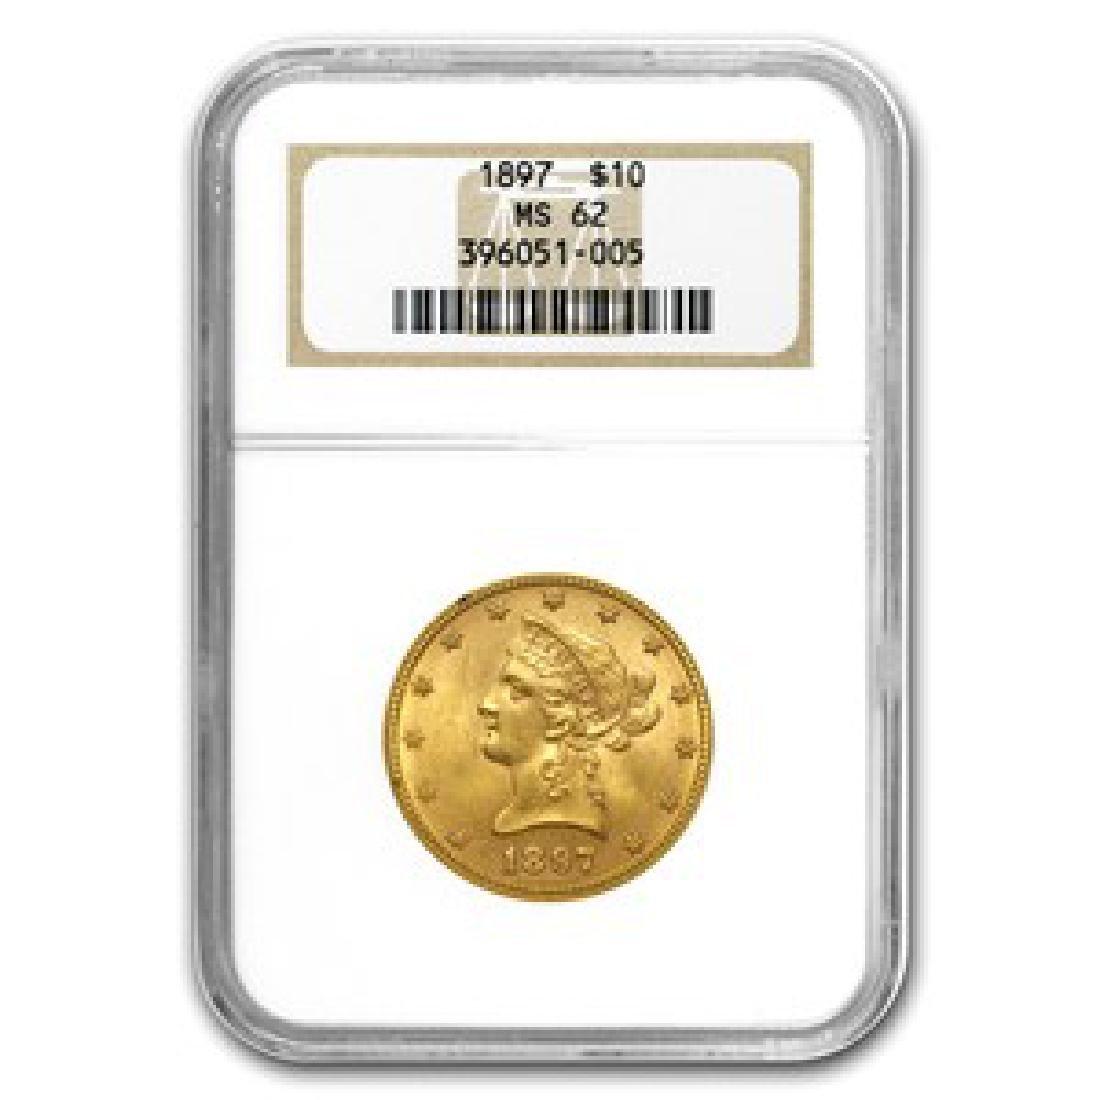 1897 MS 62 NGC $10 Gold Liberty Coin